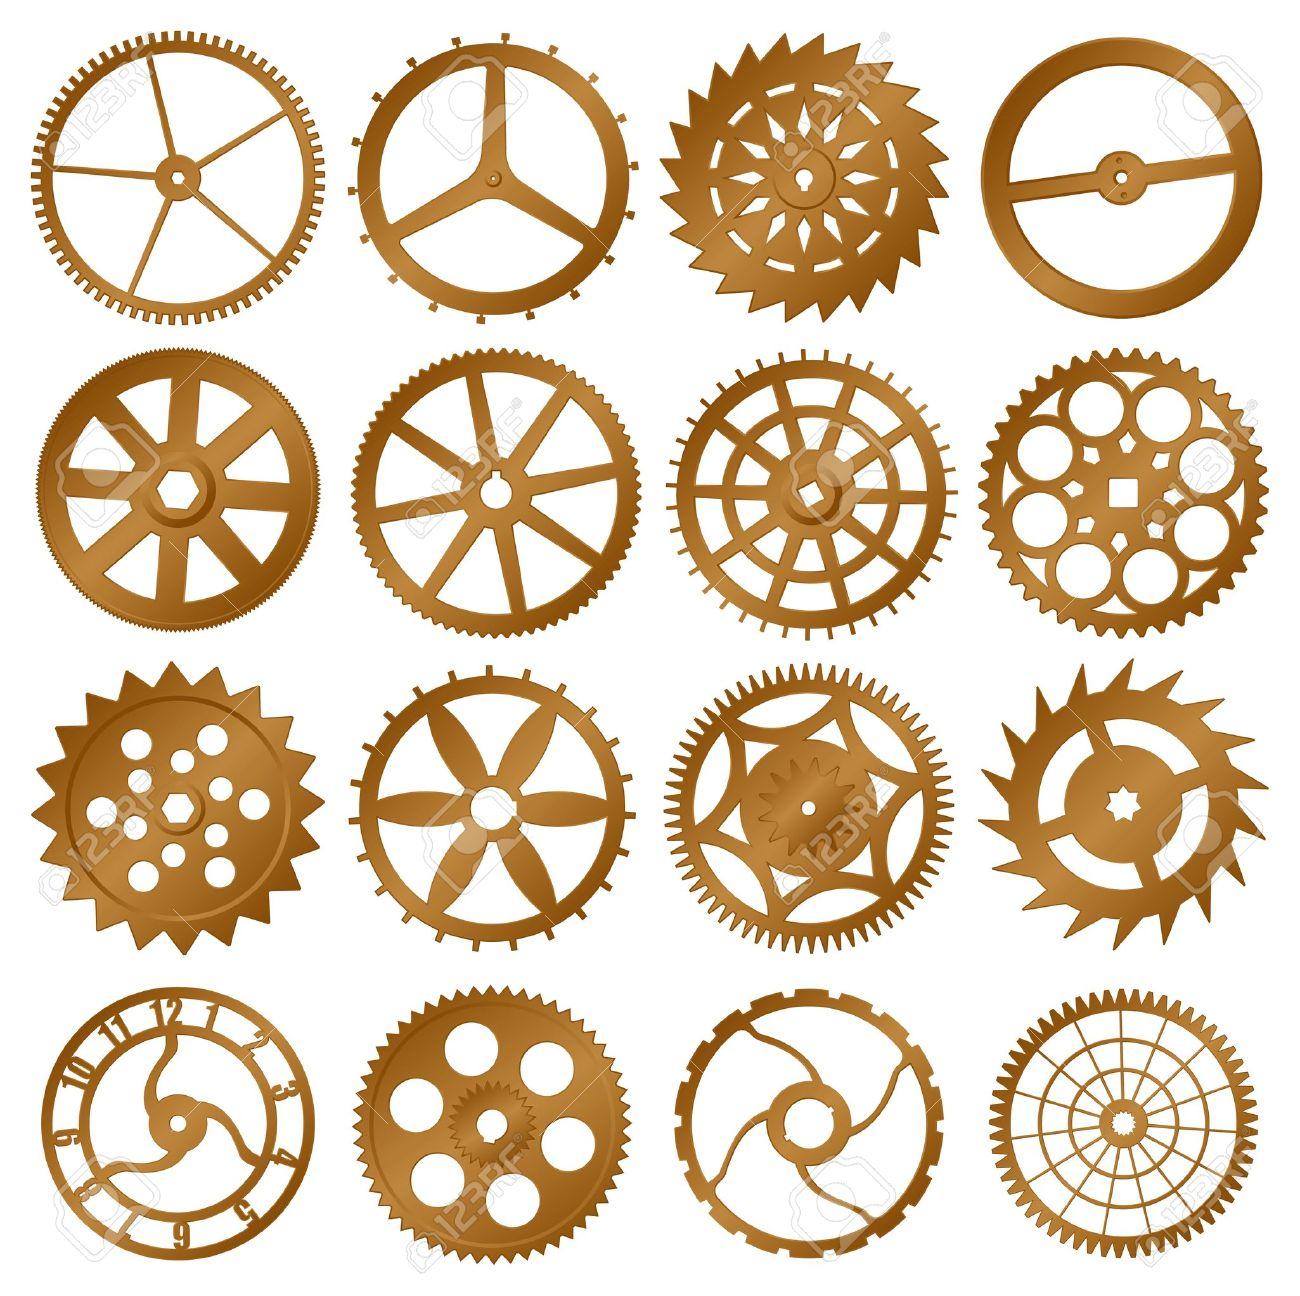 Gears clipart clock gear Elements  Patterns journal scrap